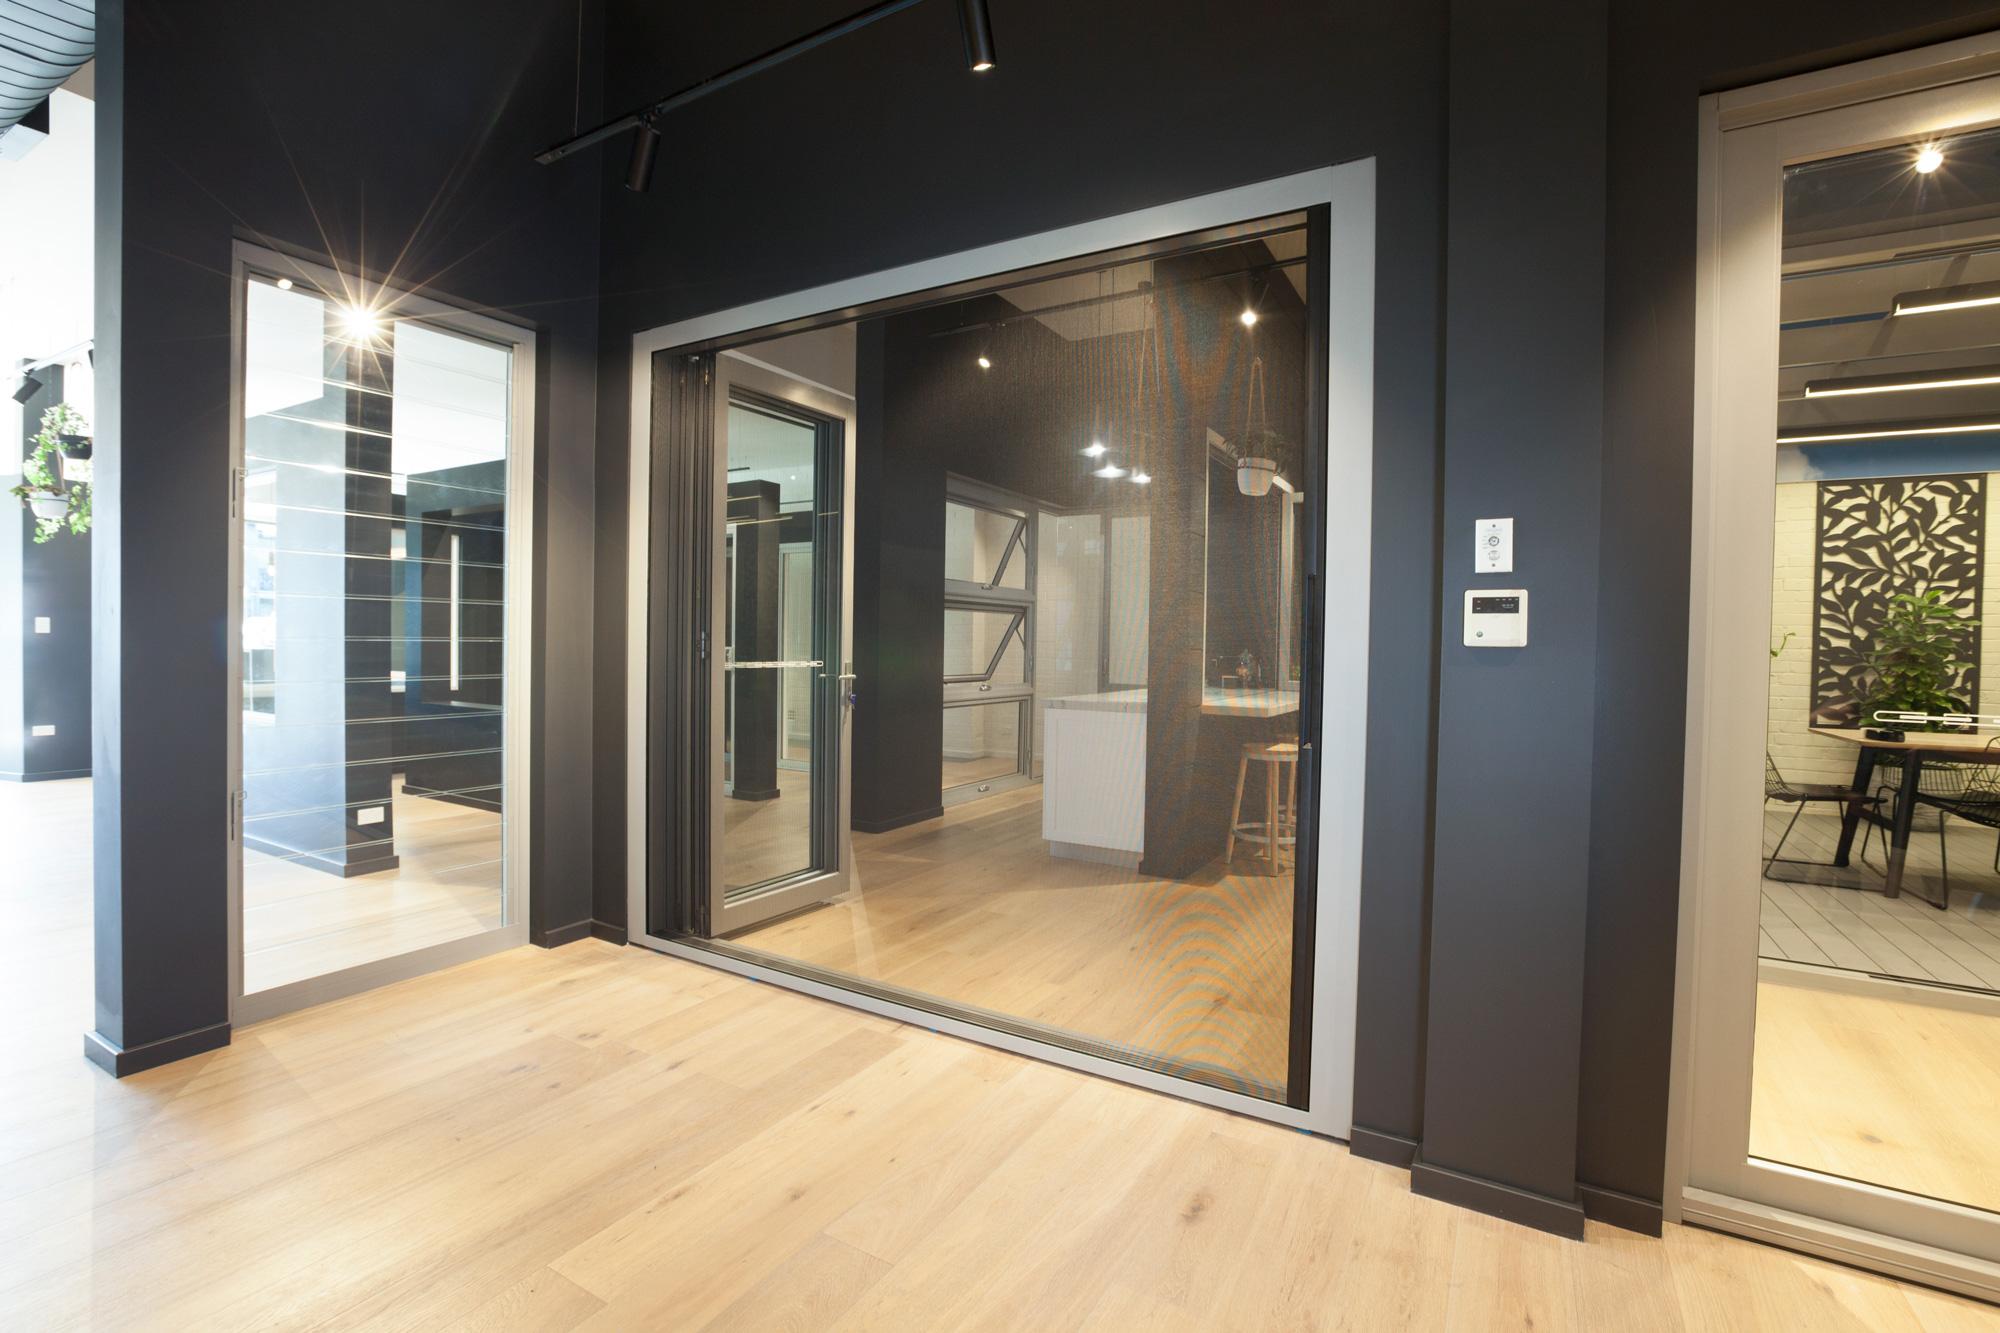 Paragon bi-fold door in Precious Silver with Centor retractable screen, Wideline Rosebery Showroom